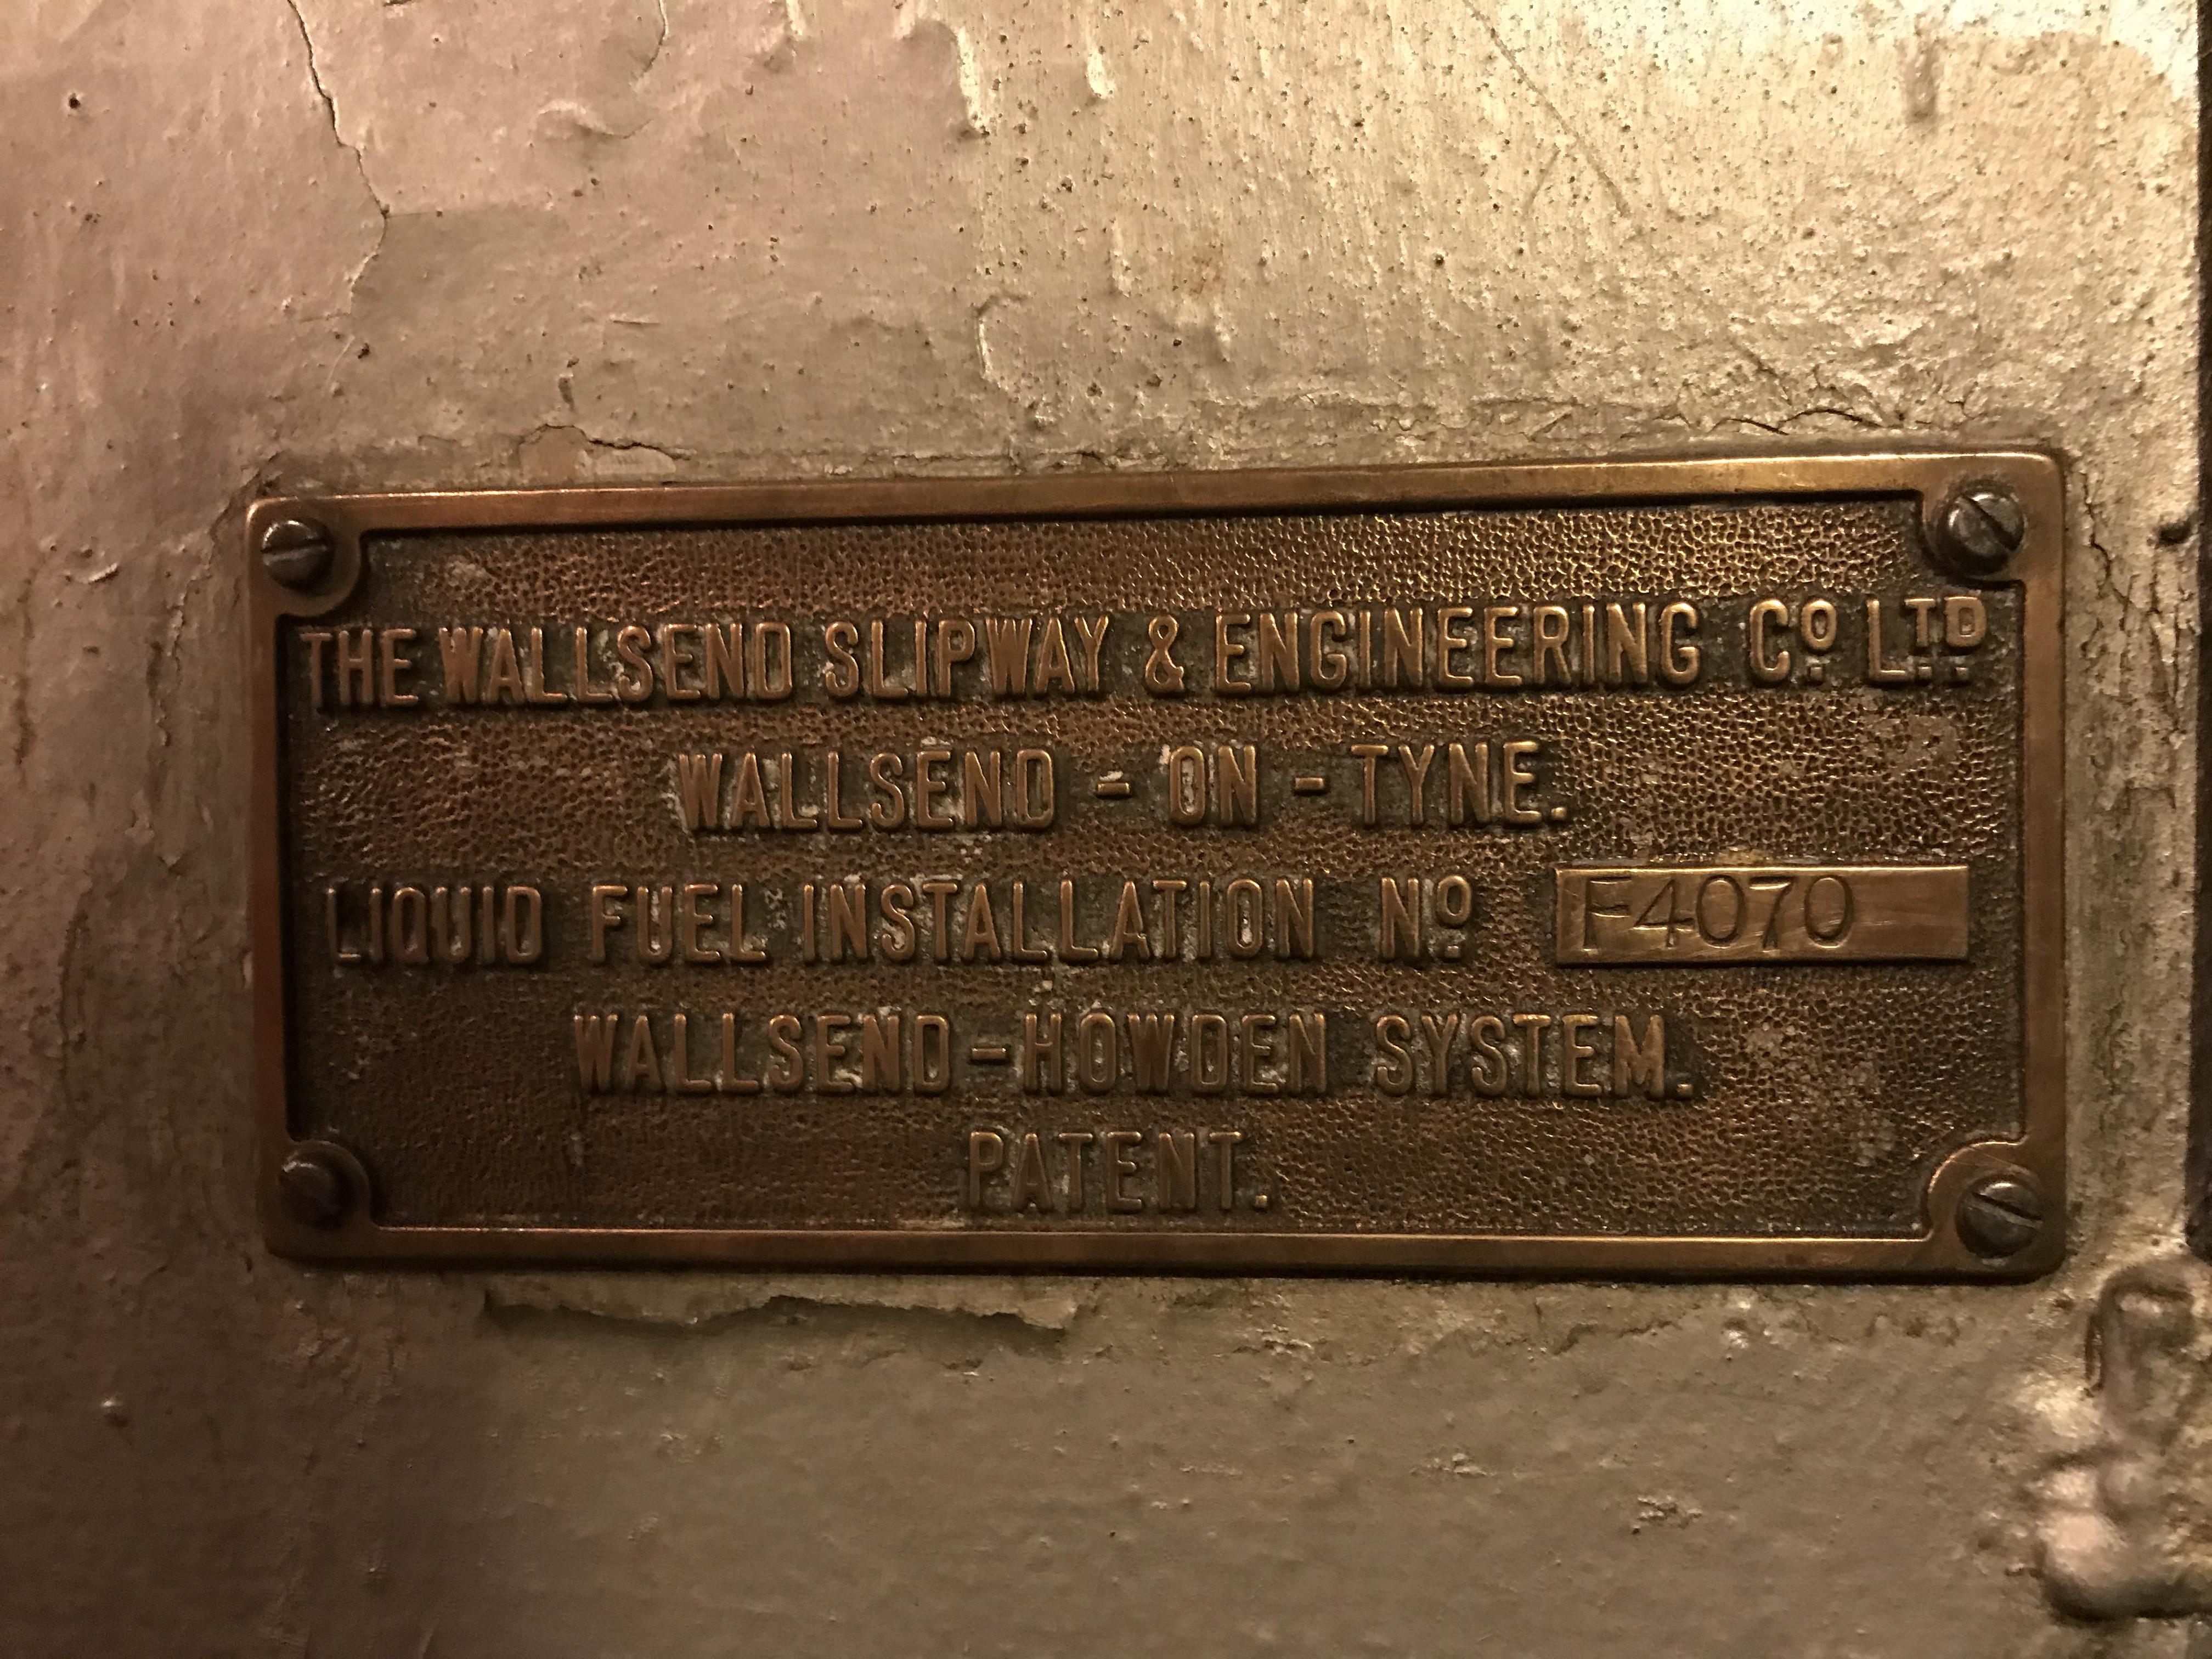 The Wallsend Slipway & Engineering colin_williamson@btinternet.com Ltd  Wallsend-on-Tyne.  Liquid Fuel Installation No. F4070.  Wallsend-Howden System Patent